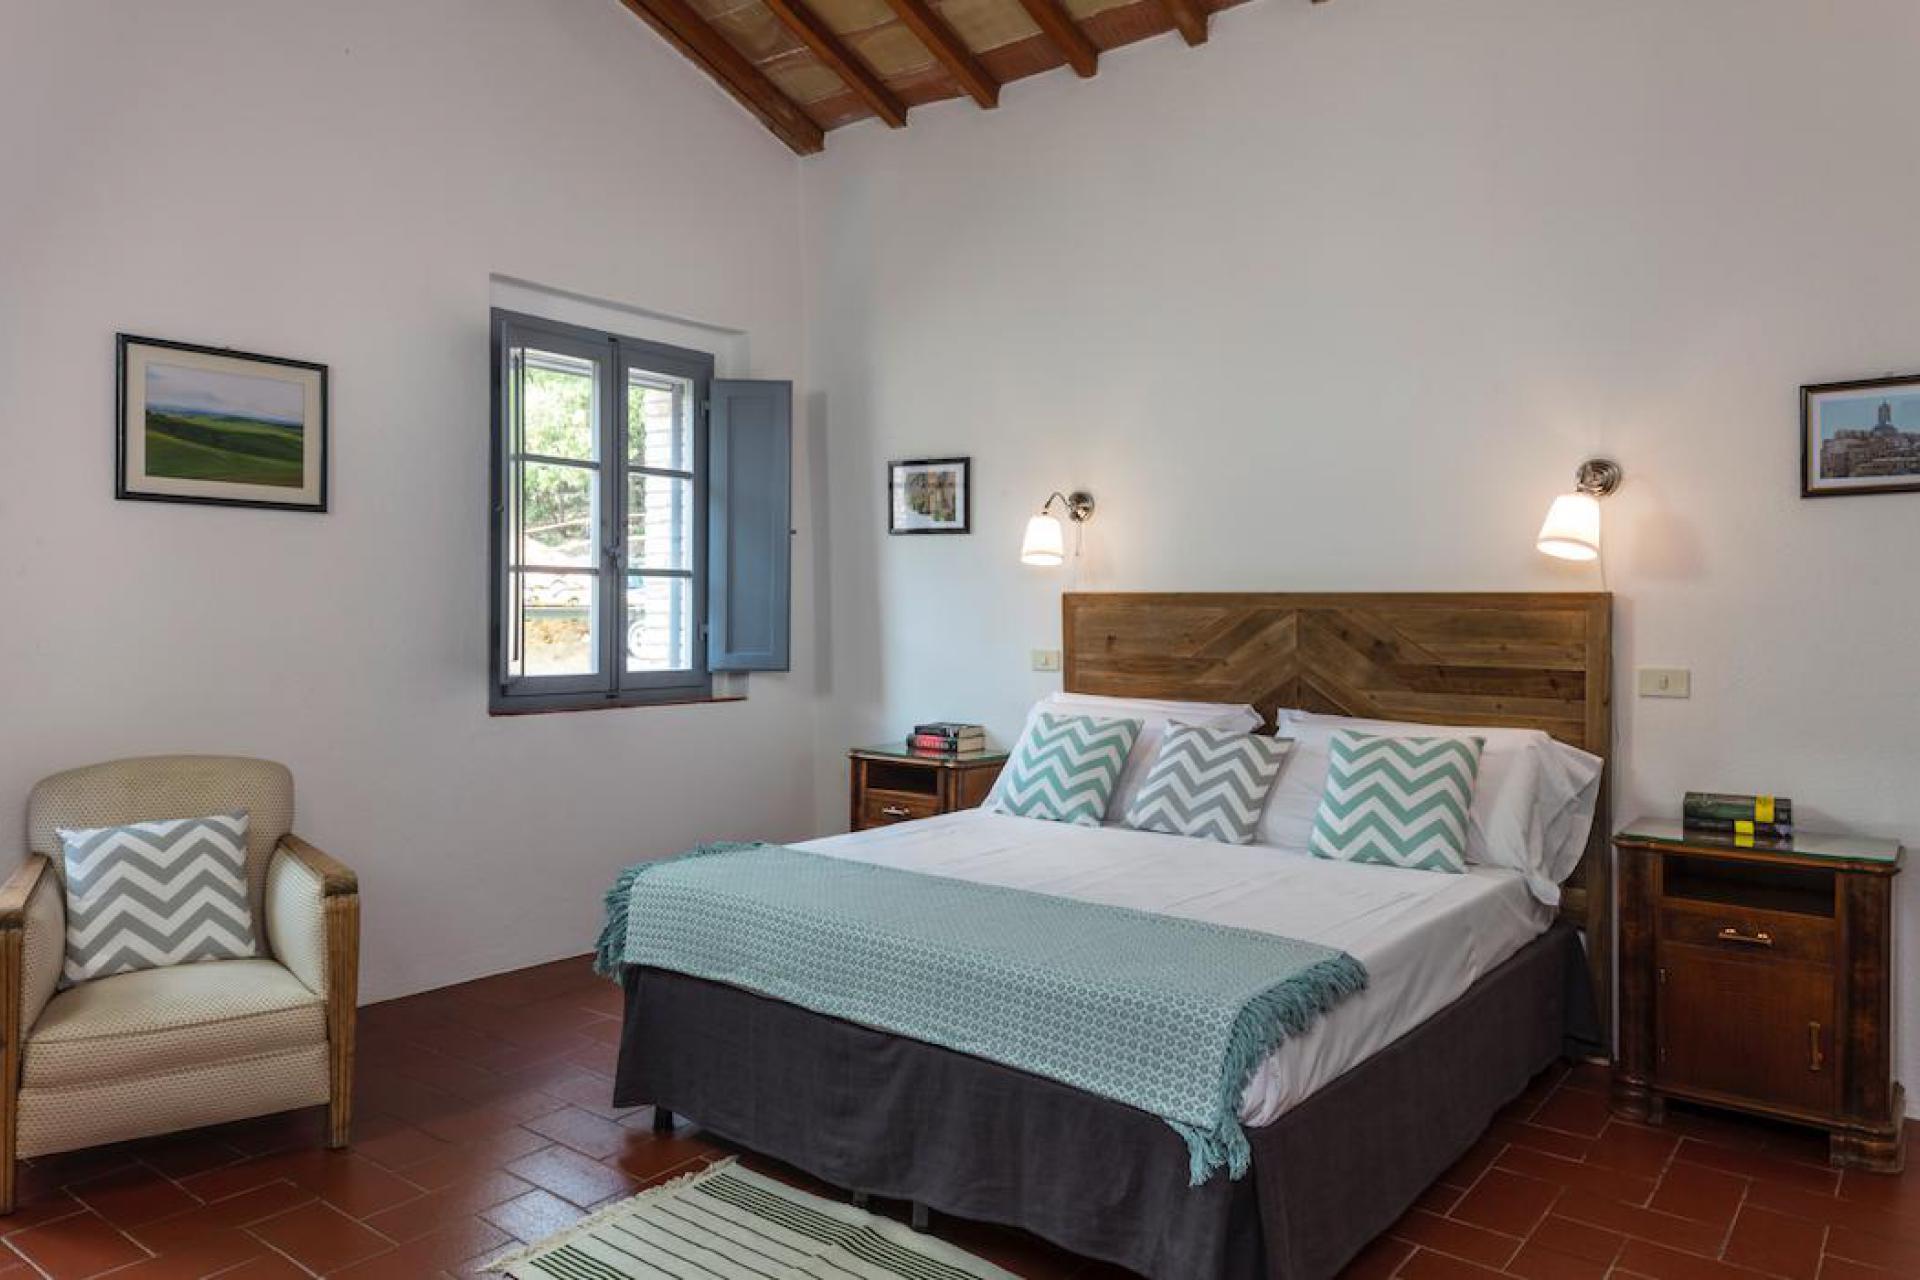 Agriturismo Toscane Comfortabele agriturismo in de ongerepte heuvels van Siena | myitaly.nl